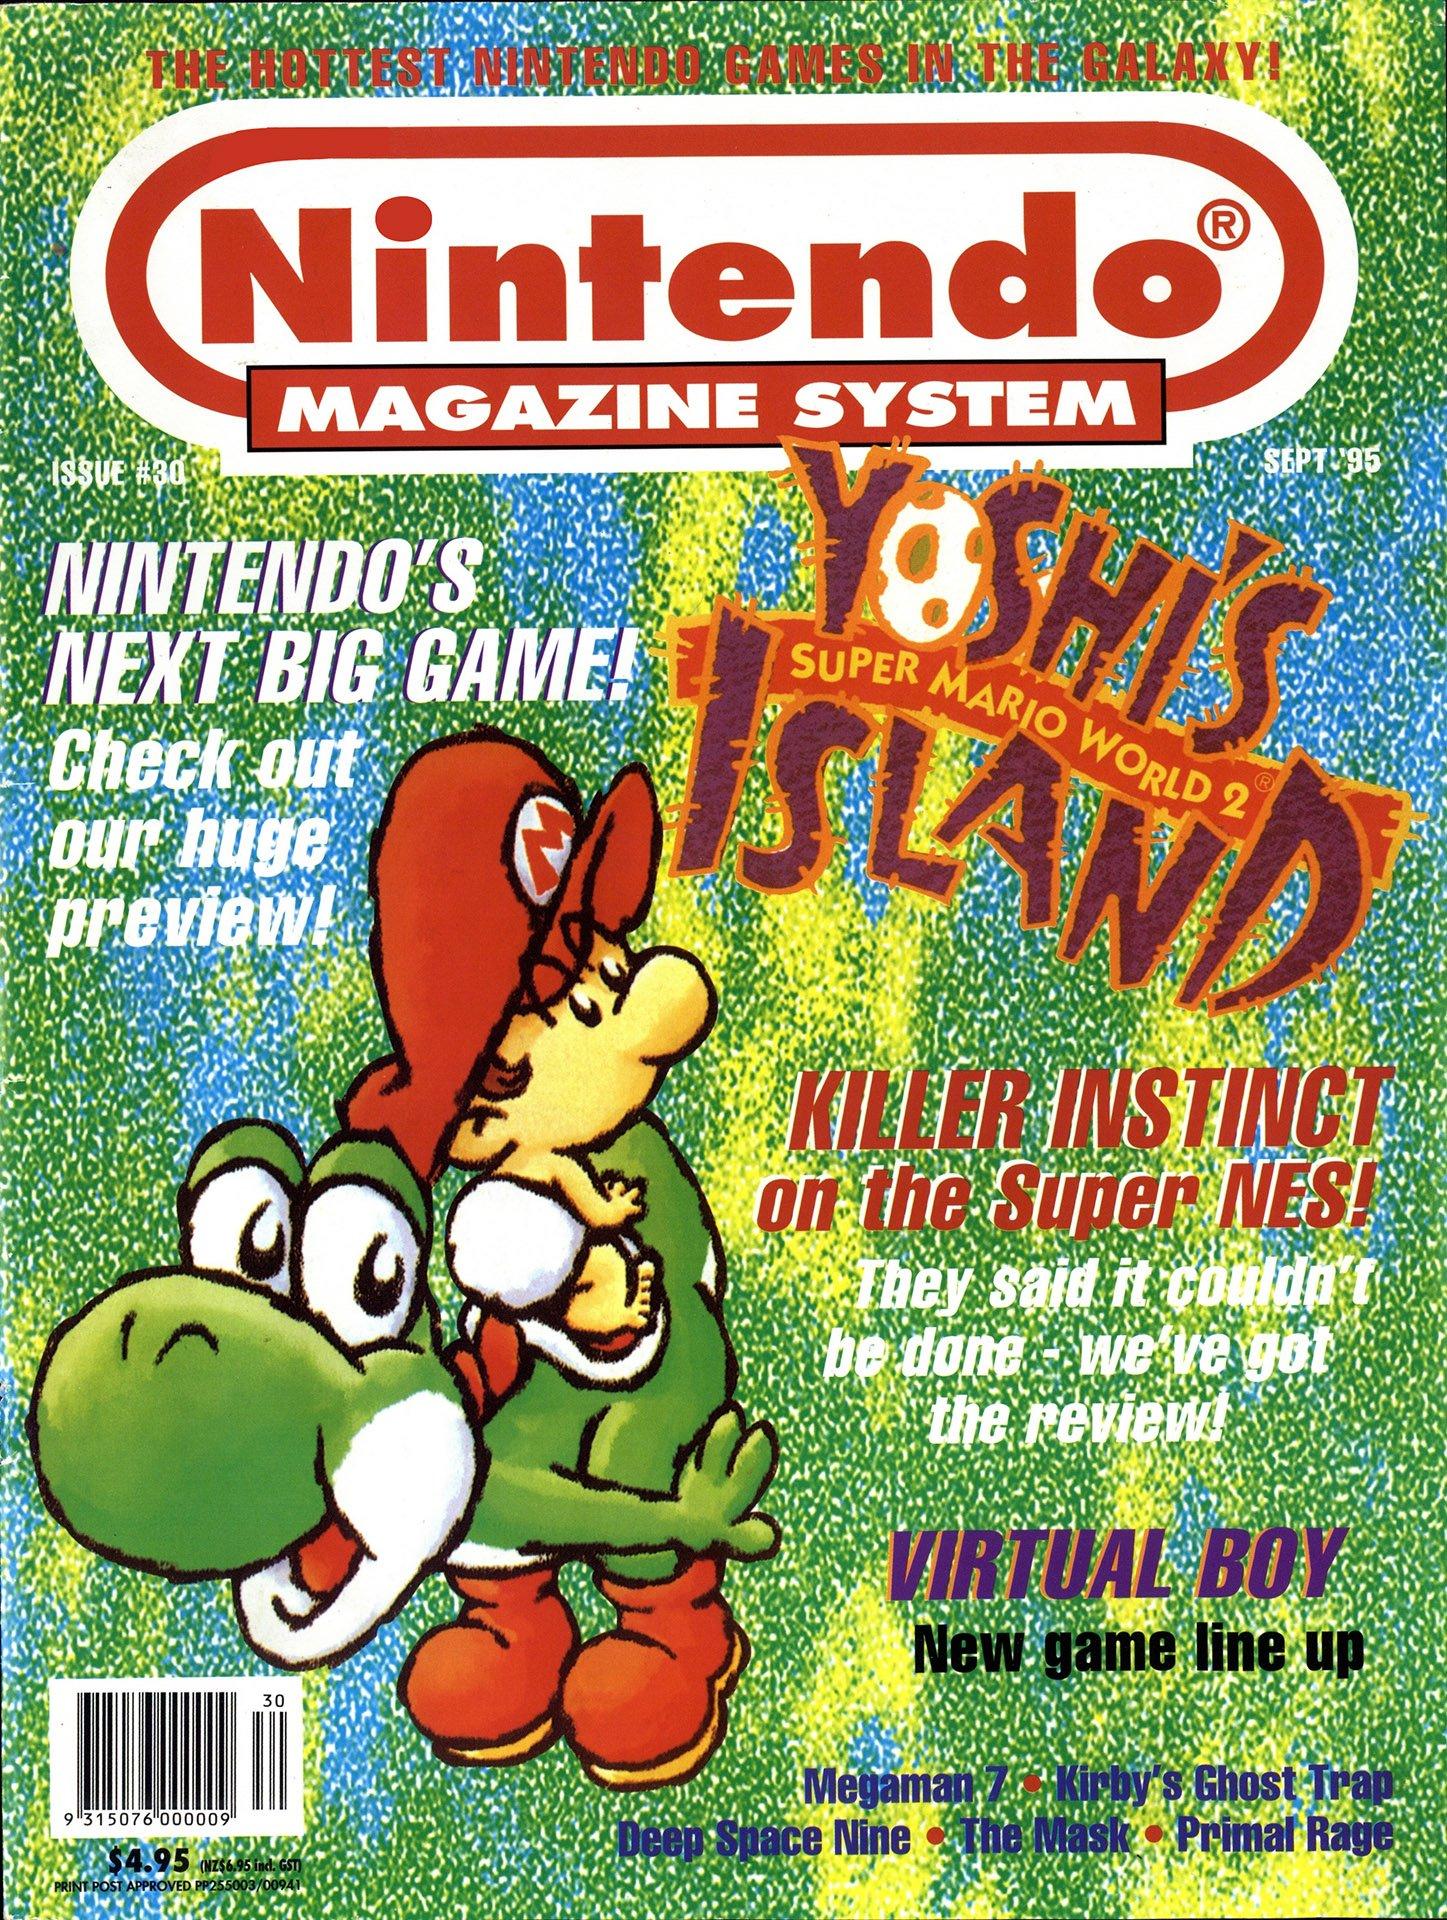 Nintendo Magazine System (AUS) 030 (September 1995)